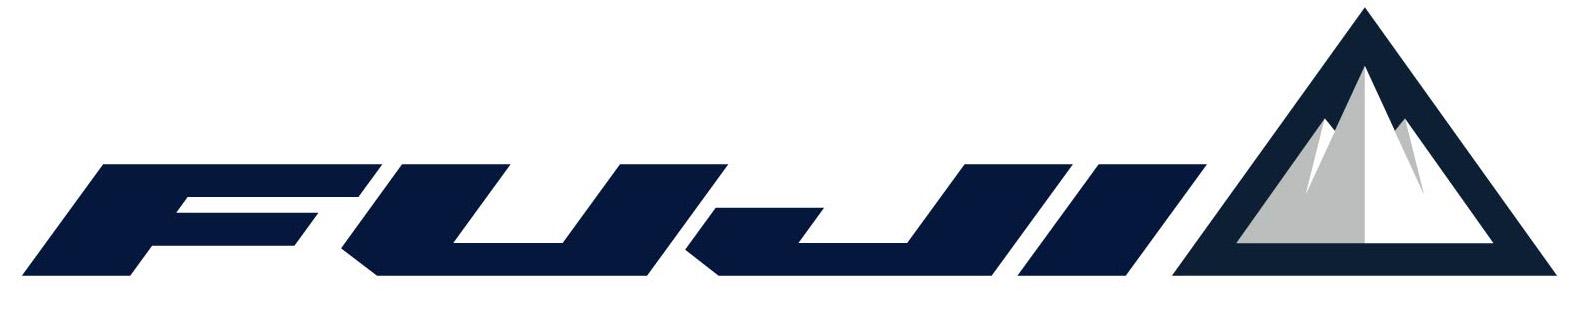 Fuji_logo.jpeg